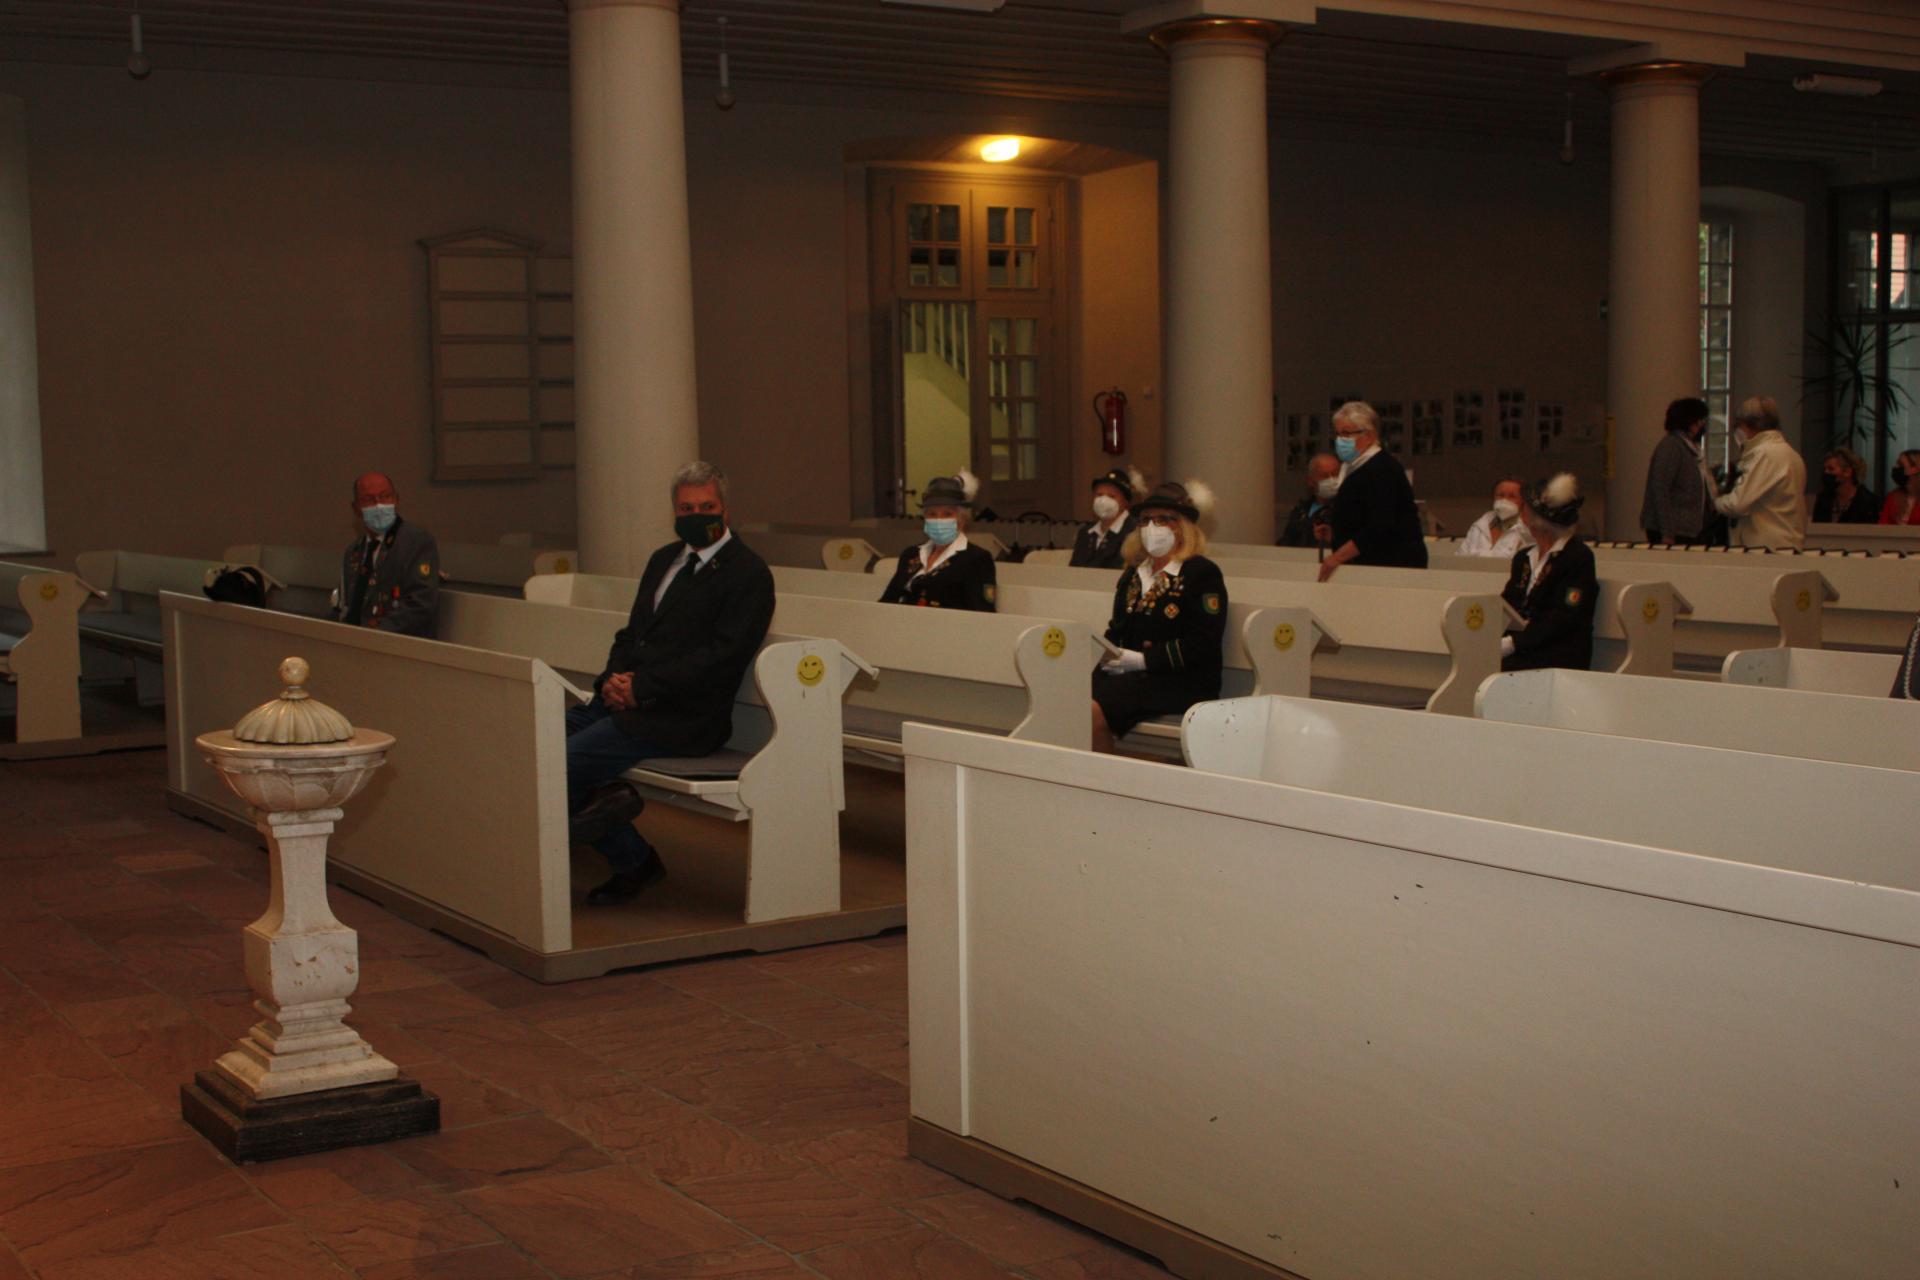 Teilnahme am Pfingstgottesdienst